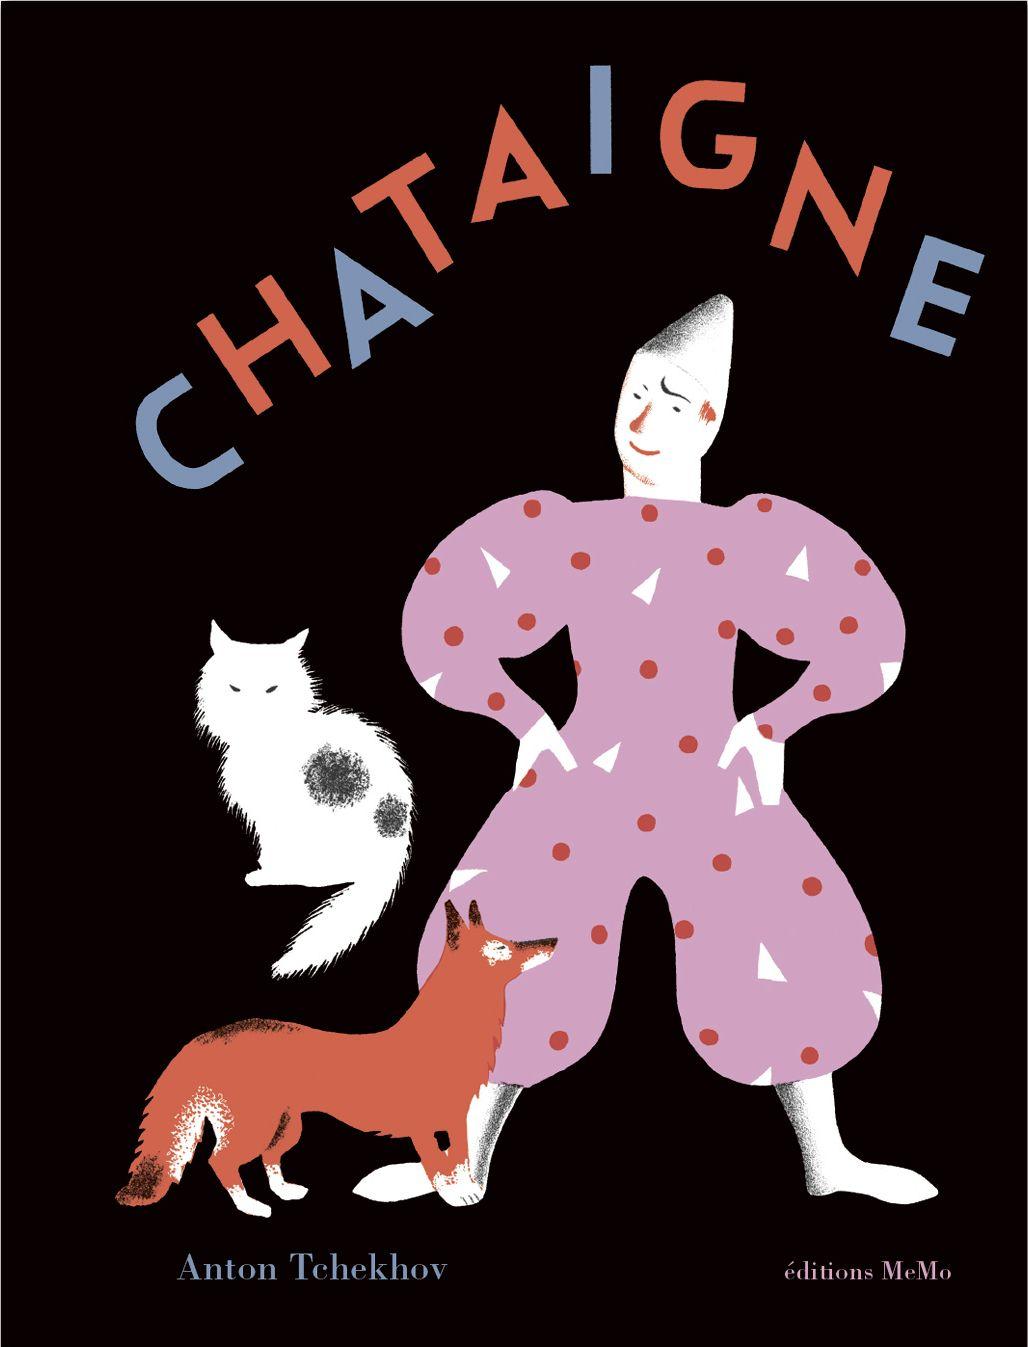 Anton Tchekhov, ill. Nathalie Parain, Chataigne. Editions MeMo, 2009.